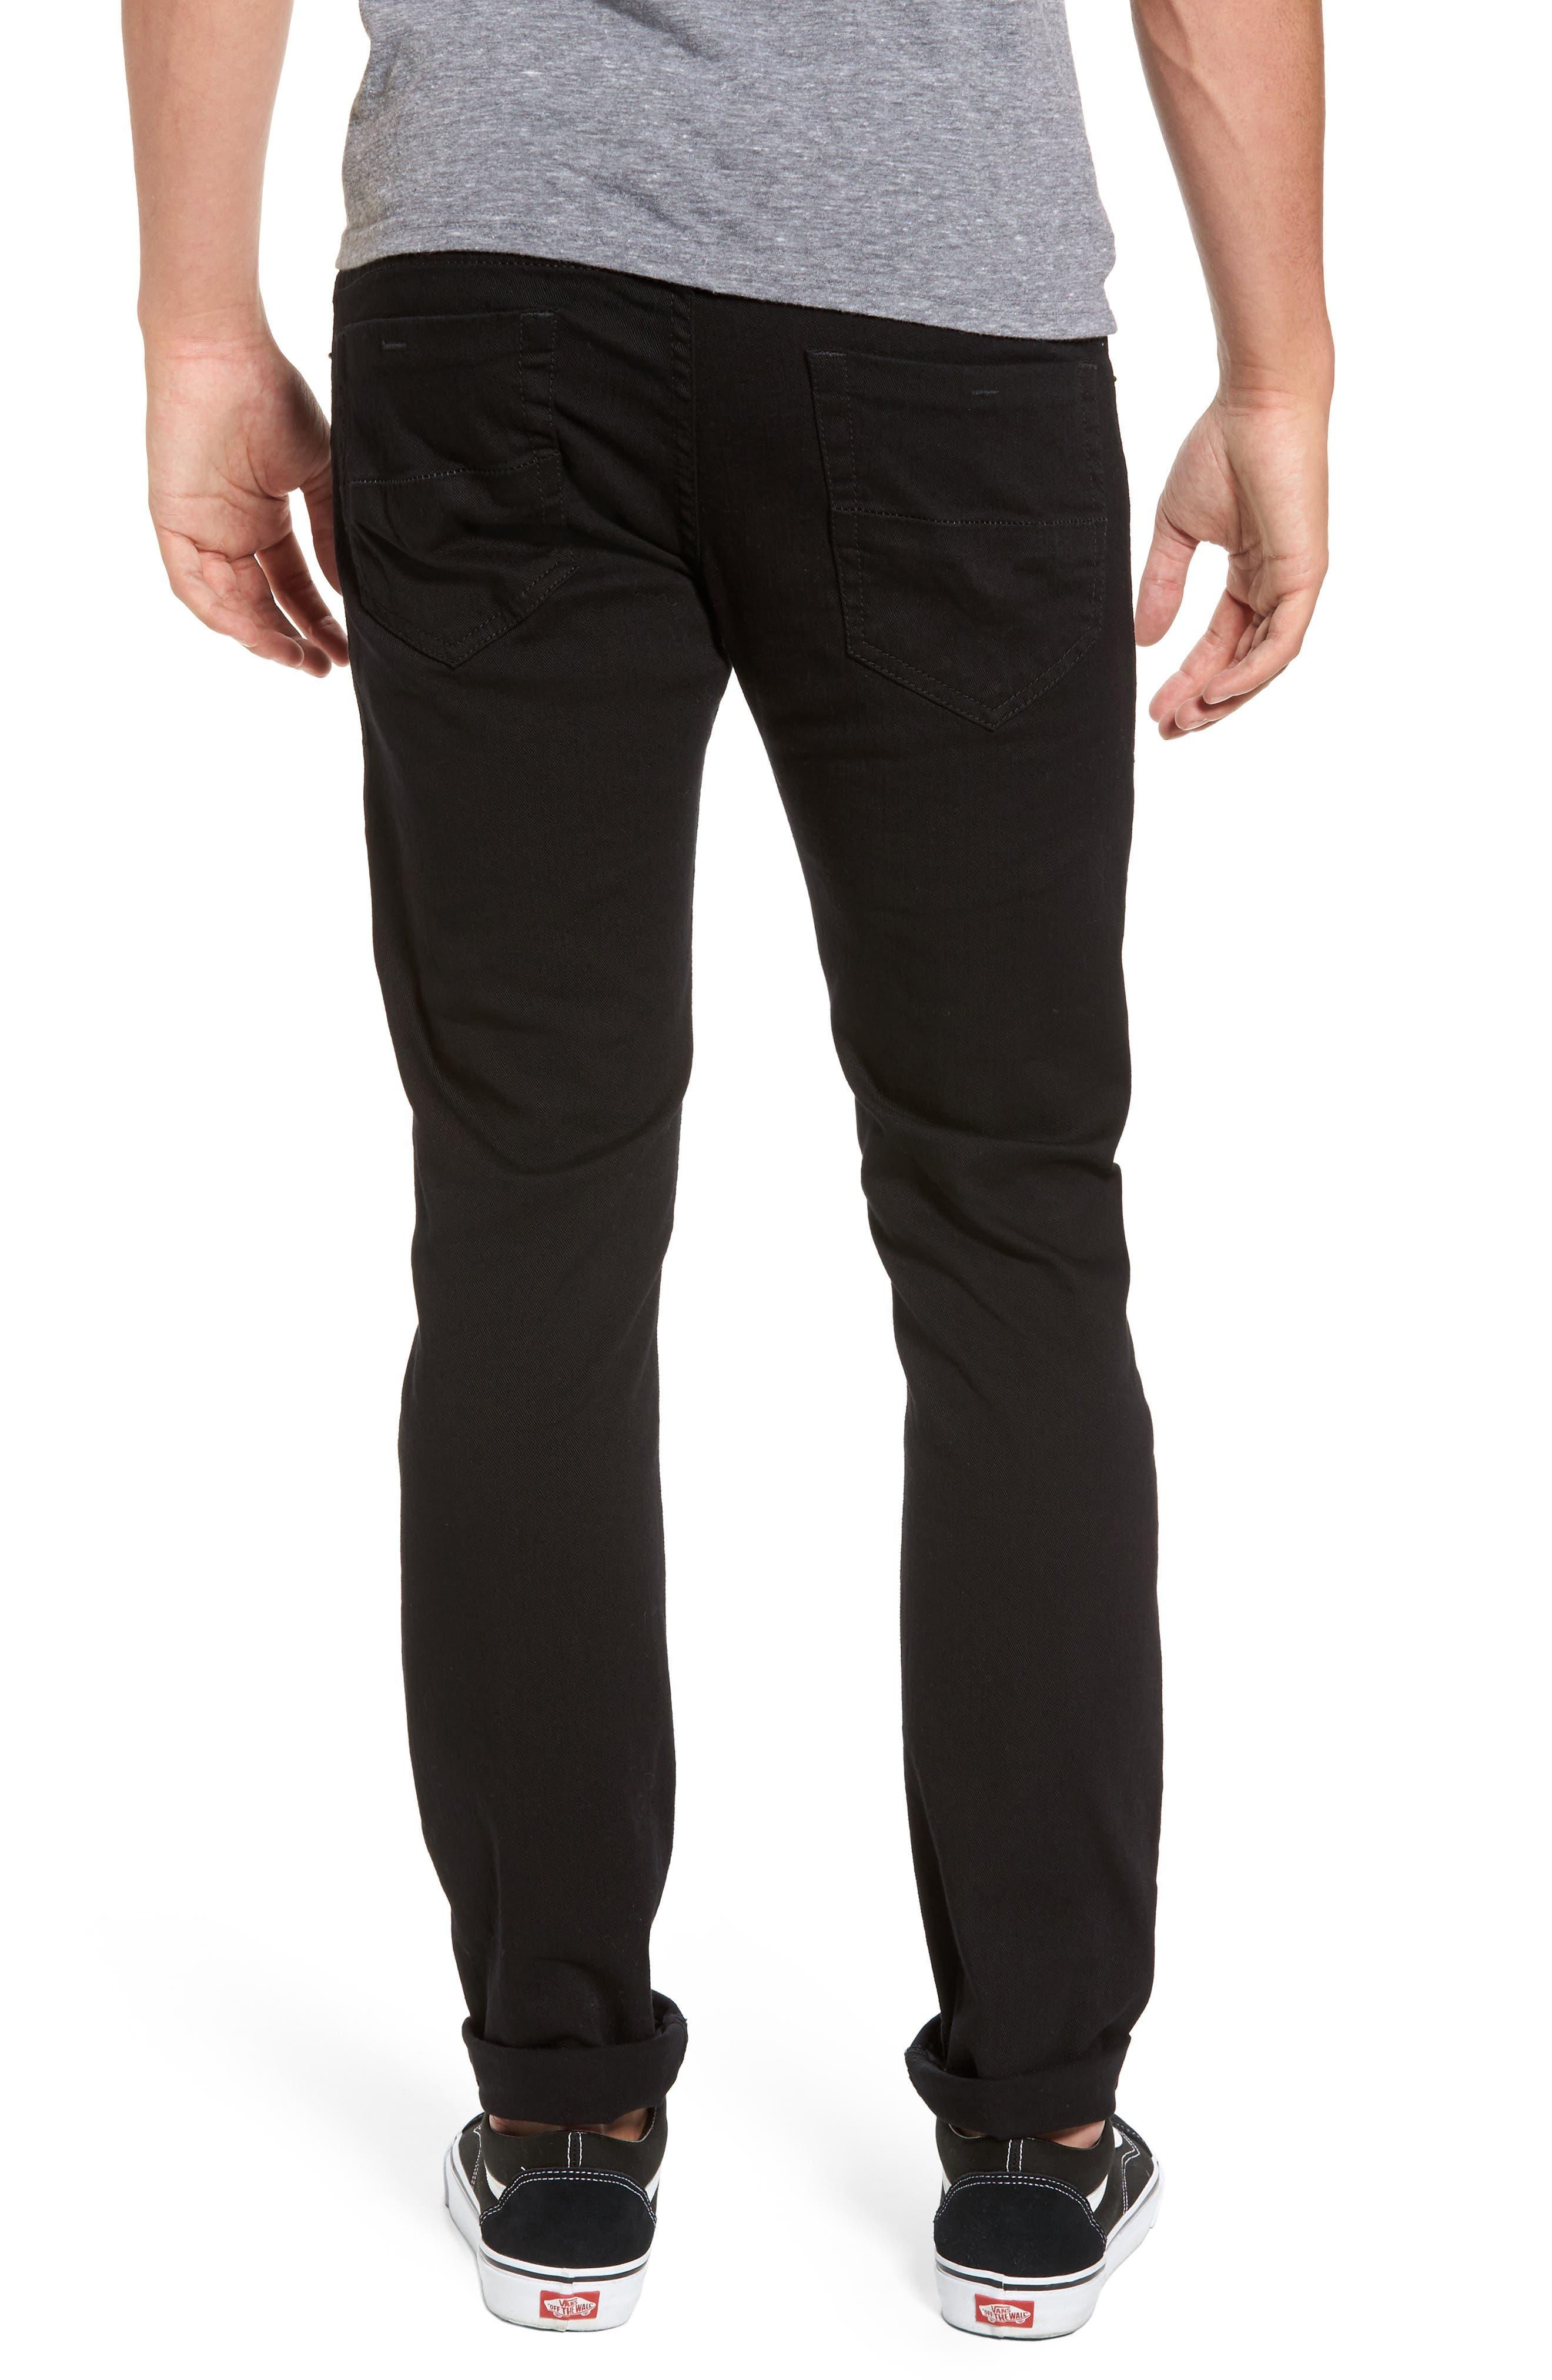 Thommer Slim Fit Jeans,                             Alternate thumbnail 2, color,                             Black/ Denim